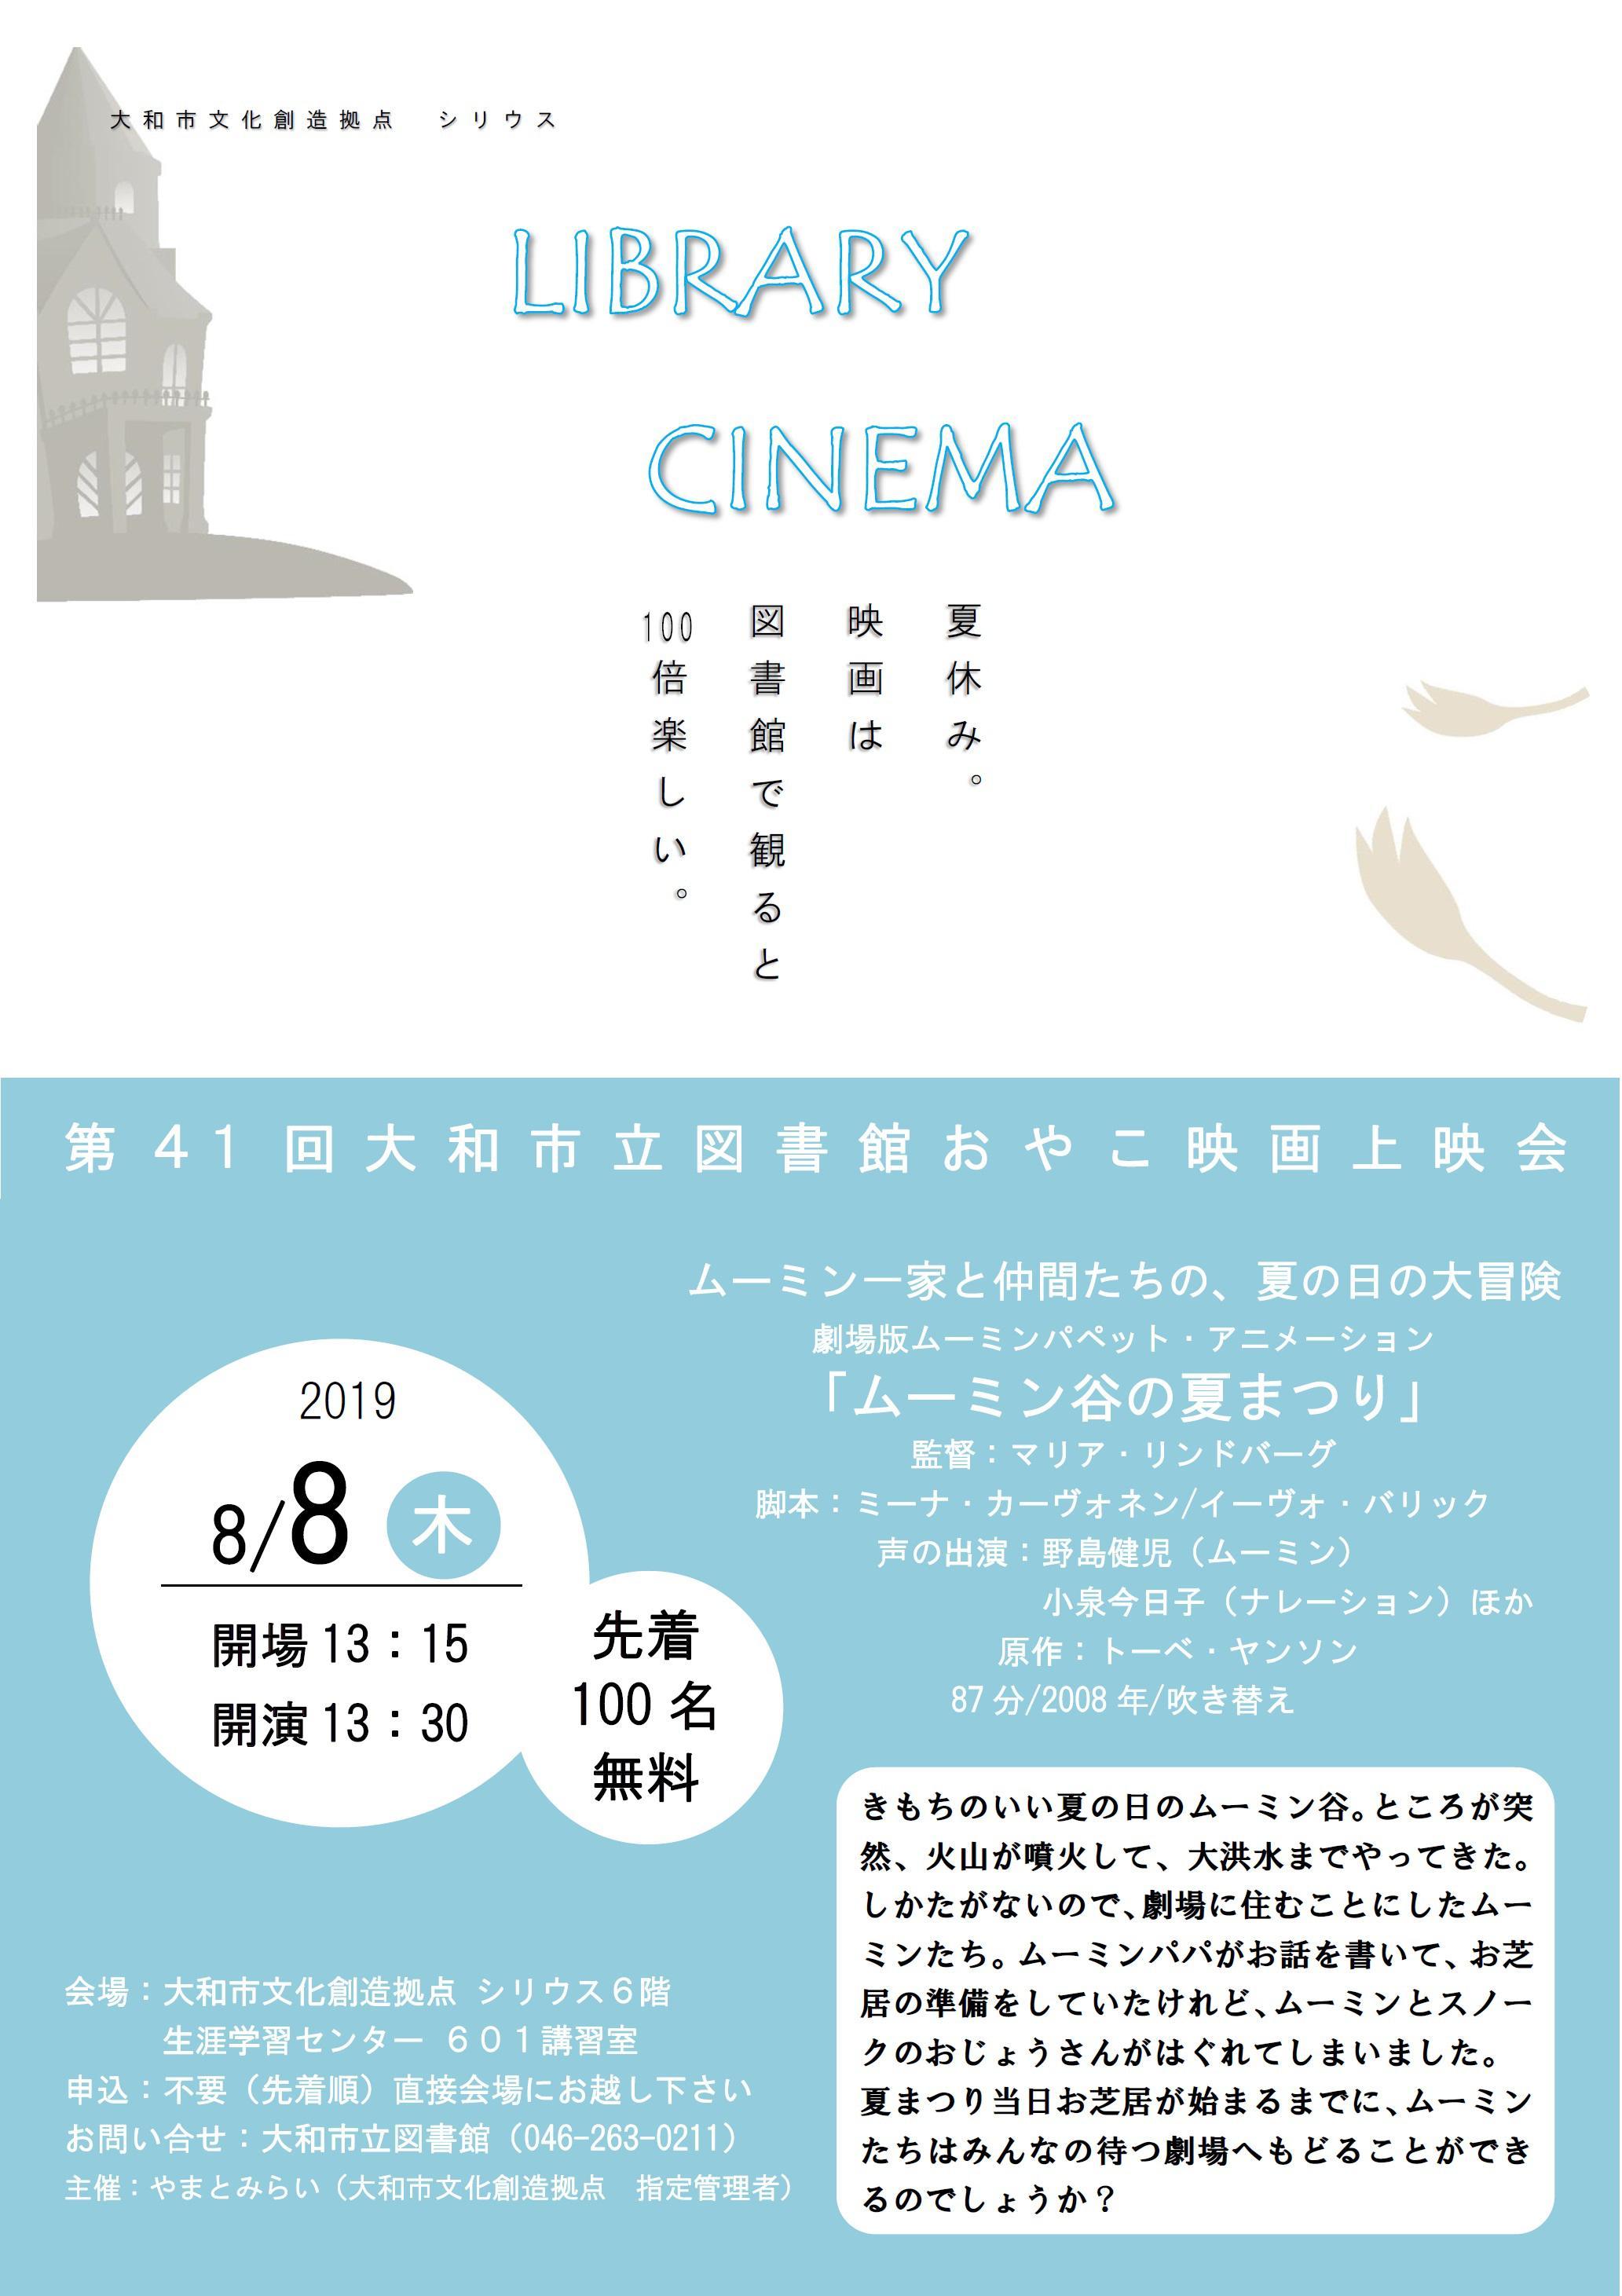 LIBRARY CINEMA第41回 大和市立図書館 おやこ映画上映会「ムーミン谷の夏まつり」